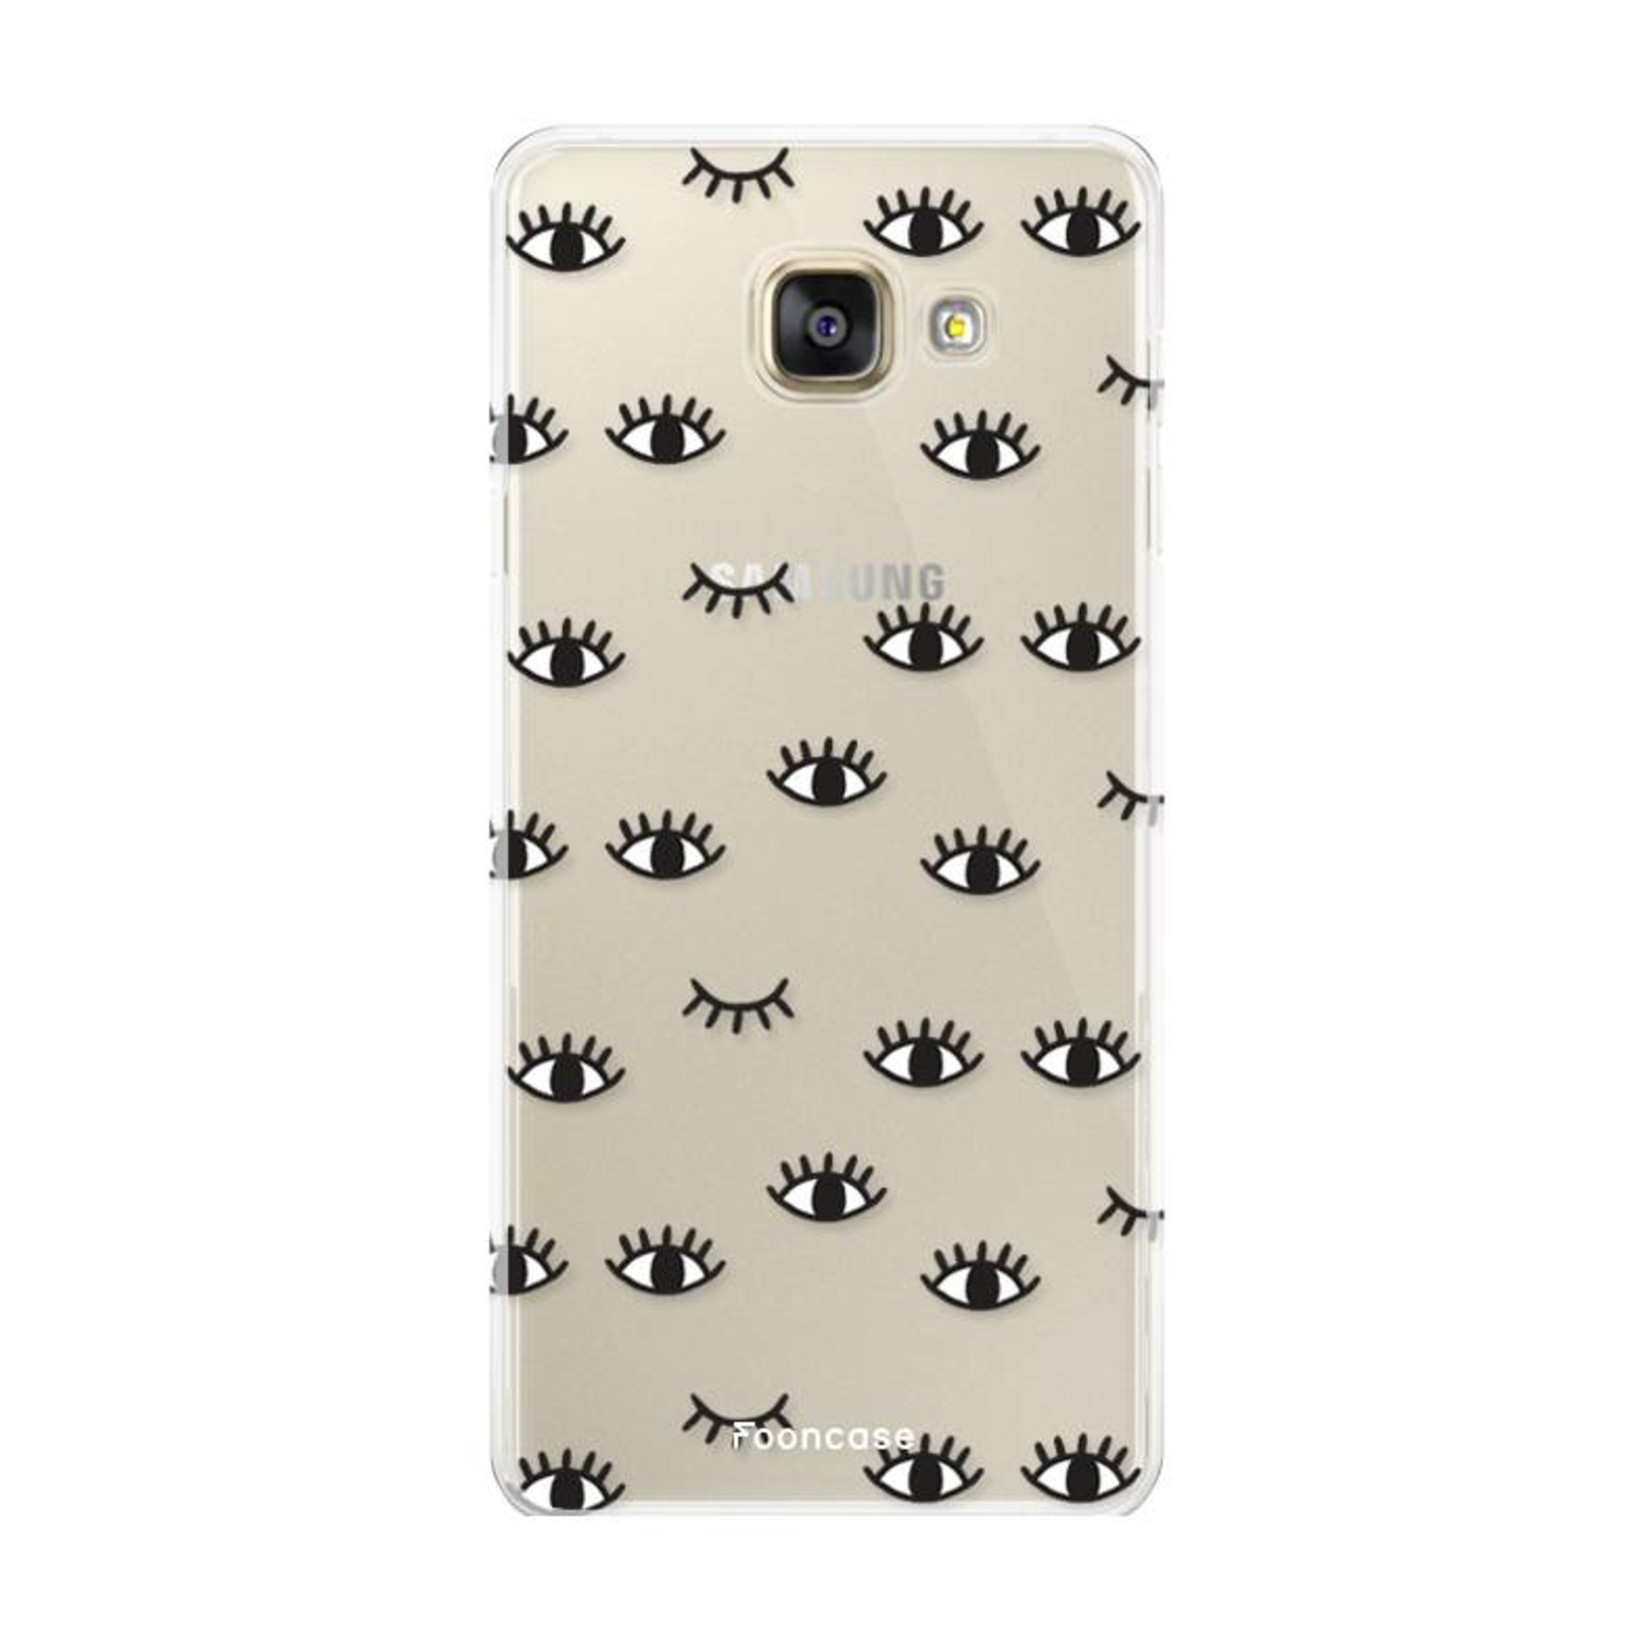 FOONCASE Samsung Galaxy A3 2017 hoesje TPU Soft Case - Back Cover - Eyes / Ogen